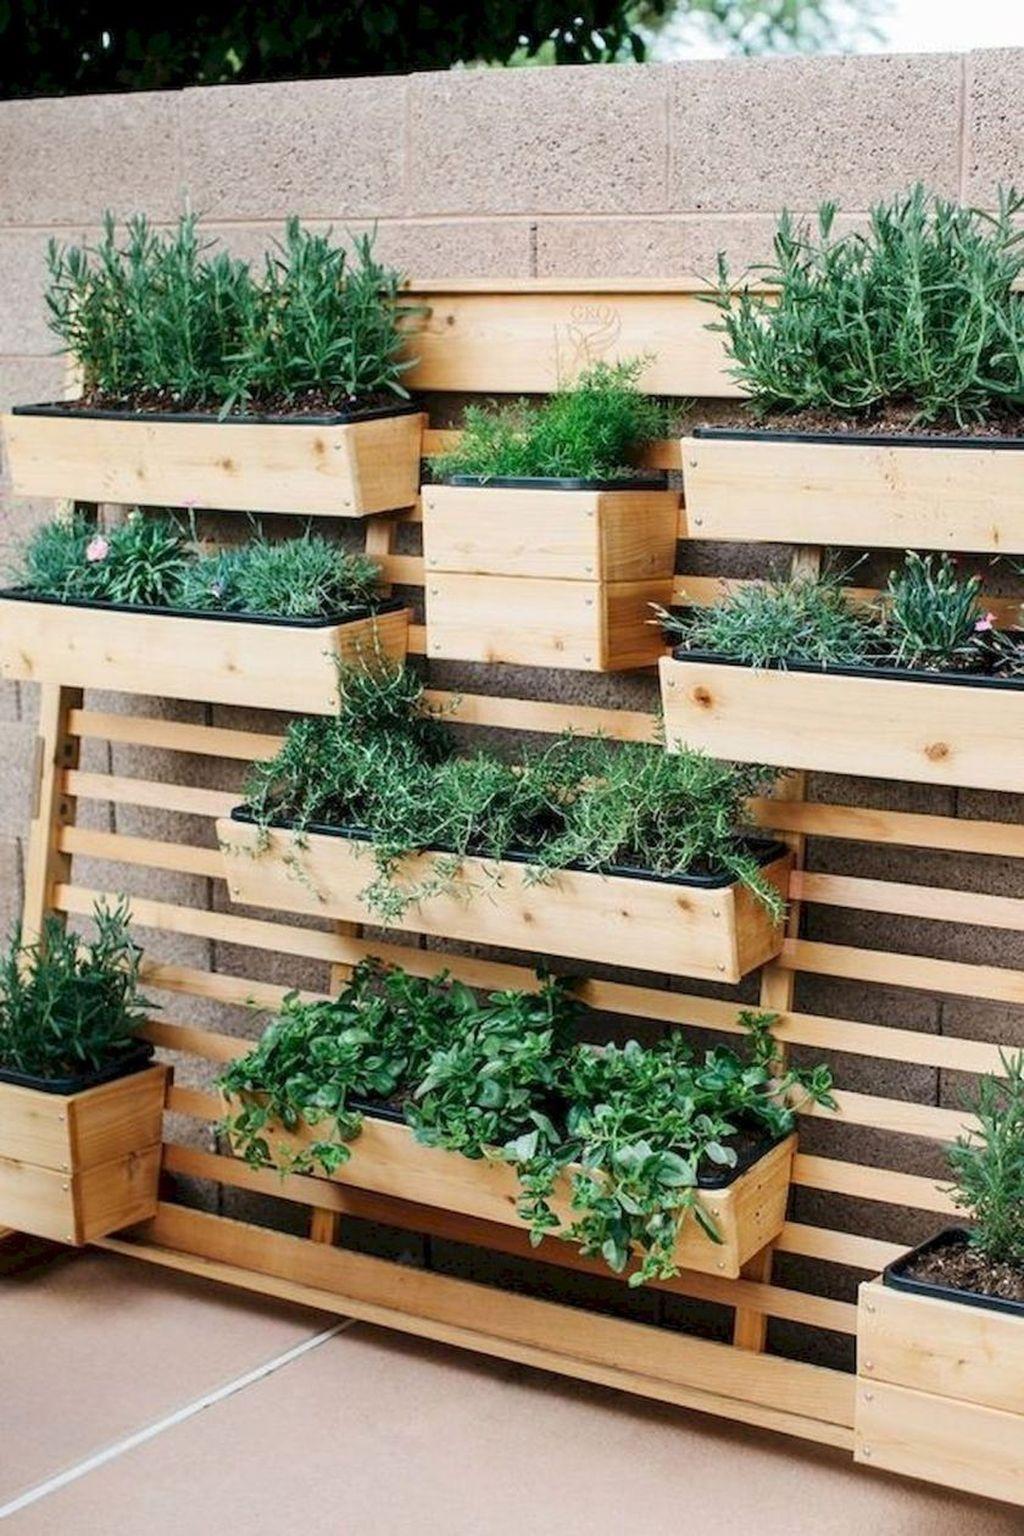 Brilliant Diy Projects Pallet Garden Design Ideas On A Budget 32